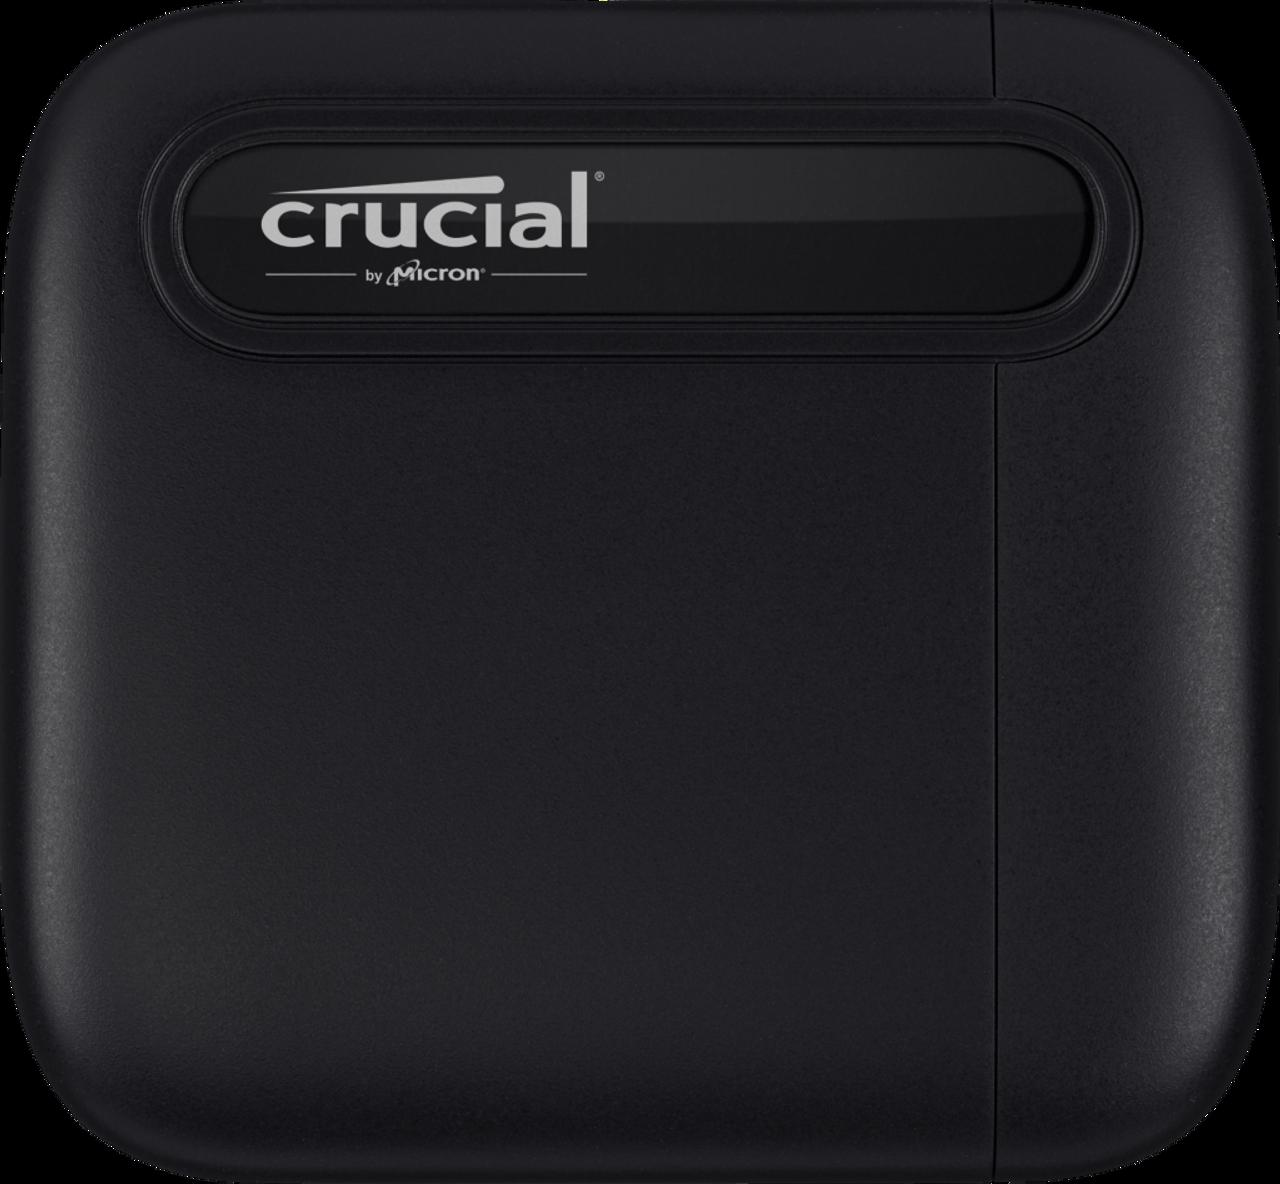 Crucial X6 500GB portable SSD_SSD-CT500X6SSD9